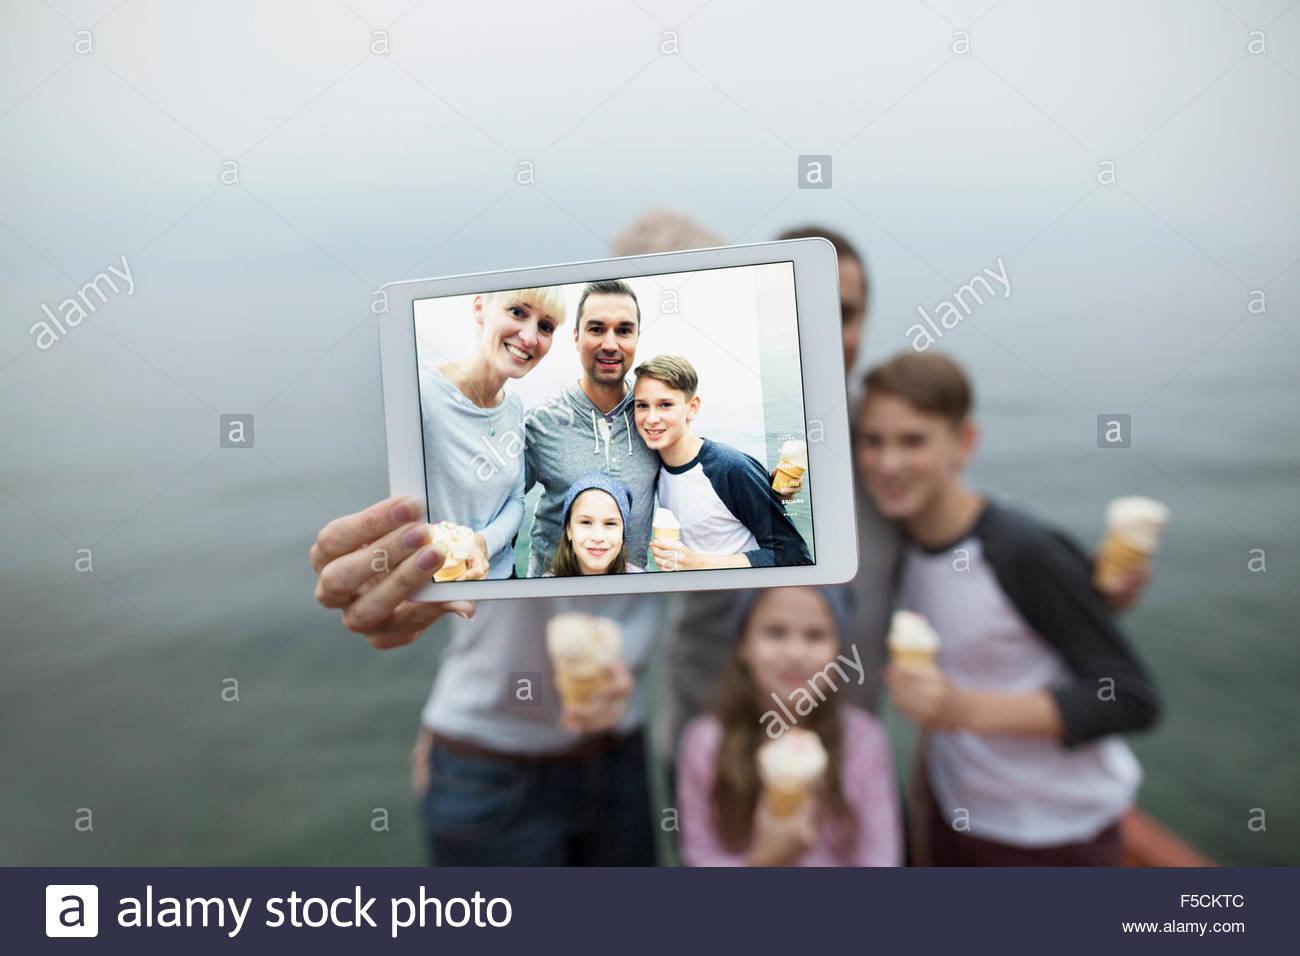 Family eating ice cream taking selfie lakeside Stock Photo